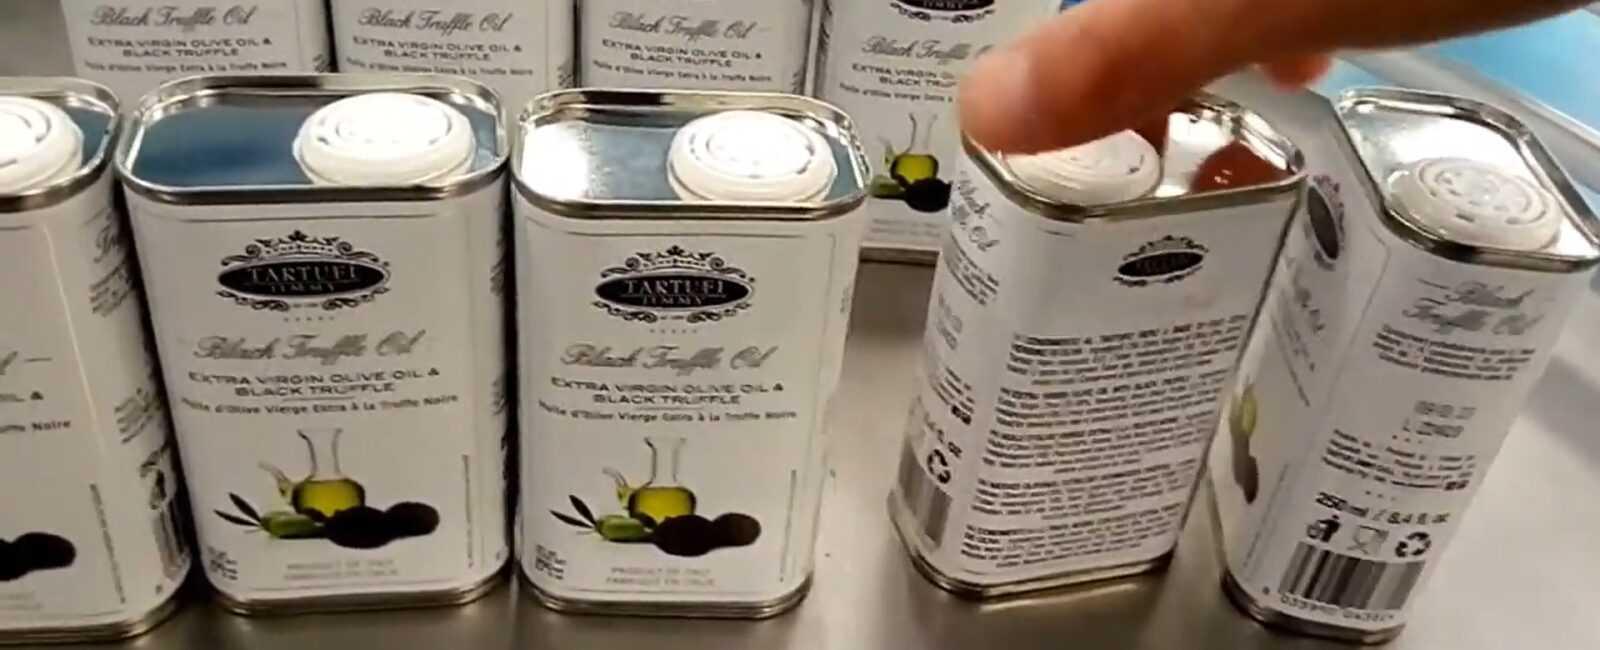 rondom labelen voeding